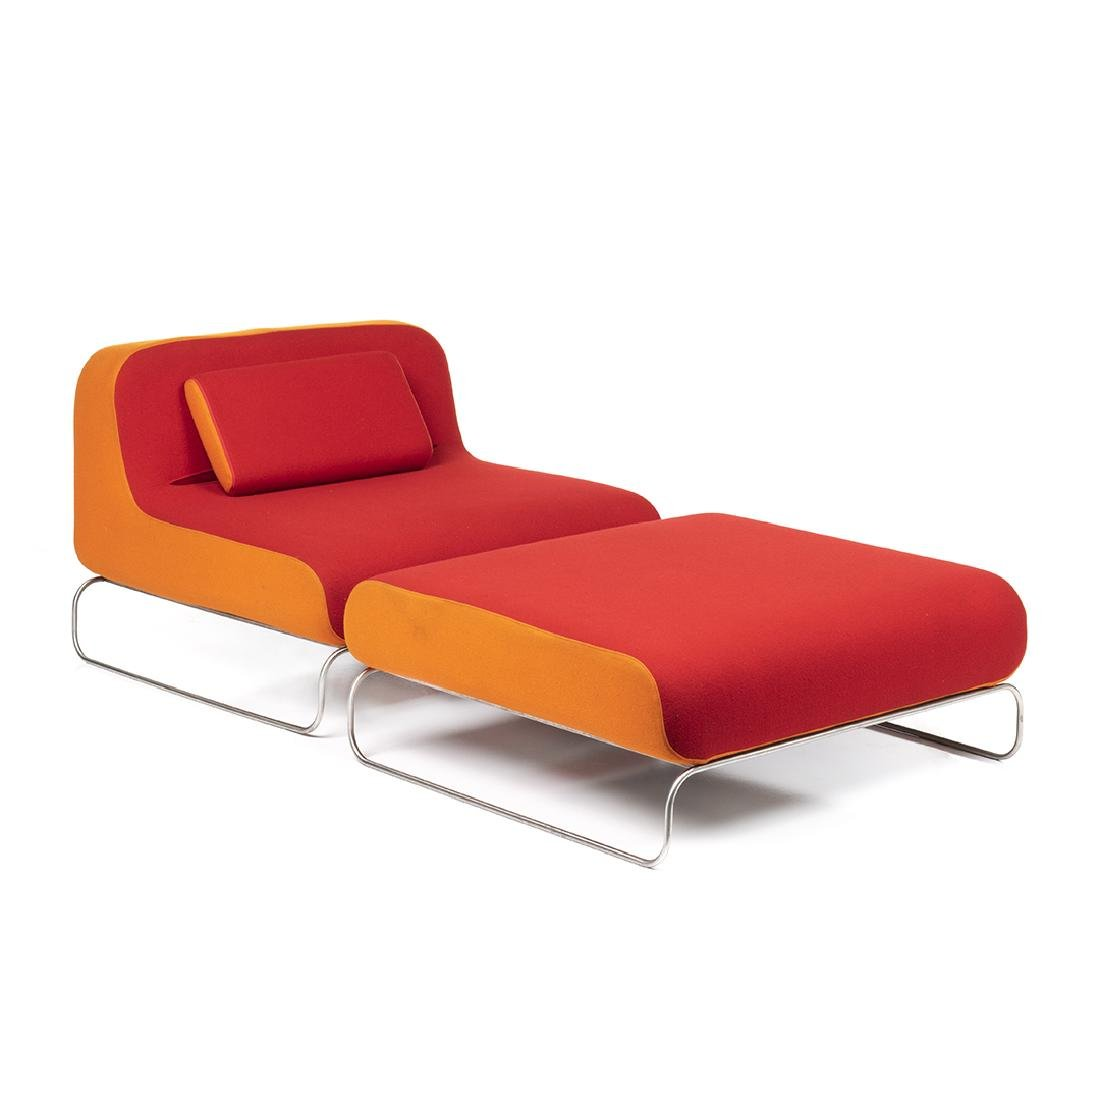 Piero Lissoni Lounge Chair and Ottoman (2)